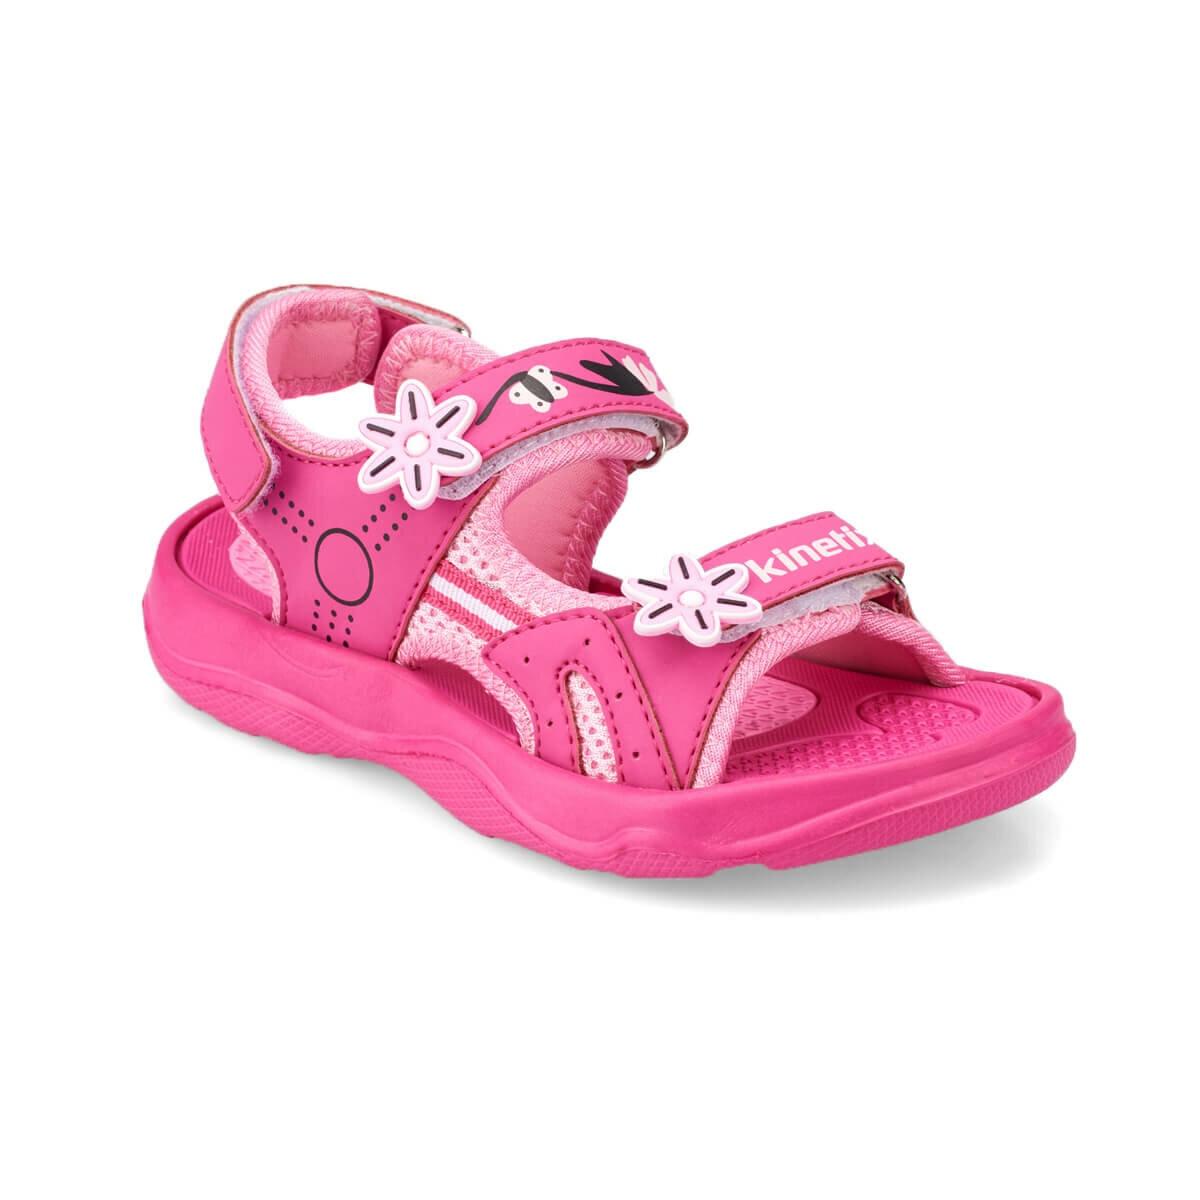 FLO KELLY Fuchsia Girls Child Sandals KINETIX